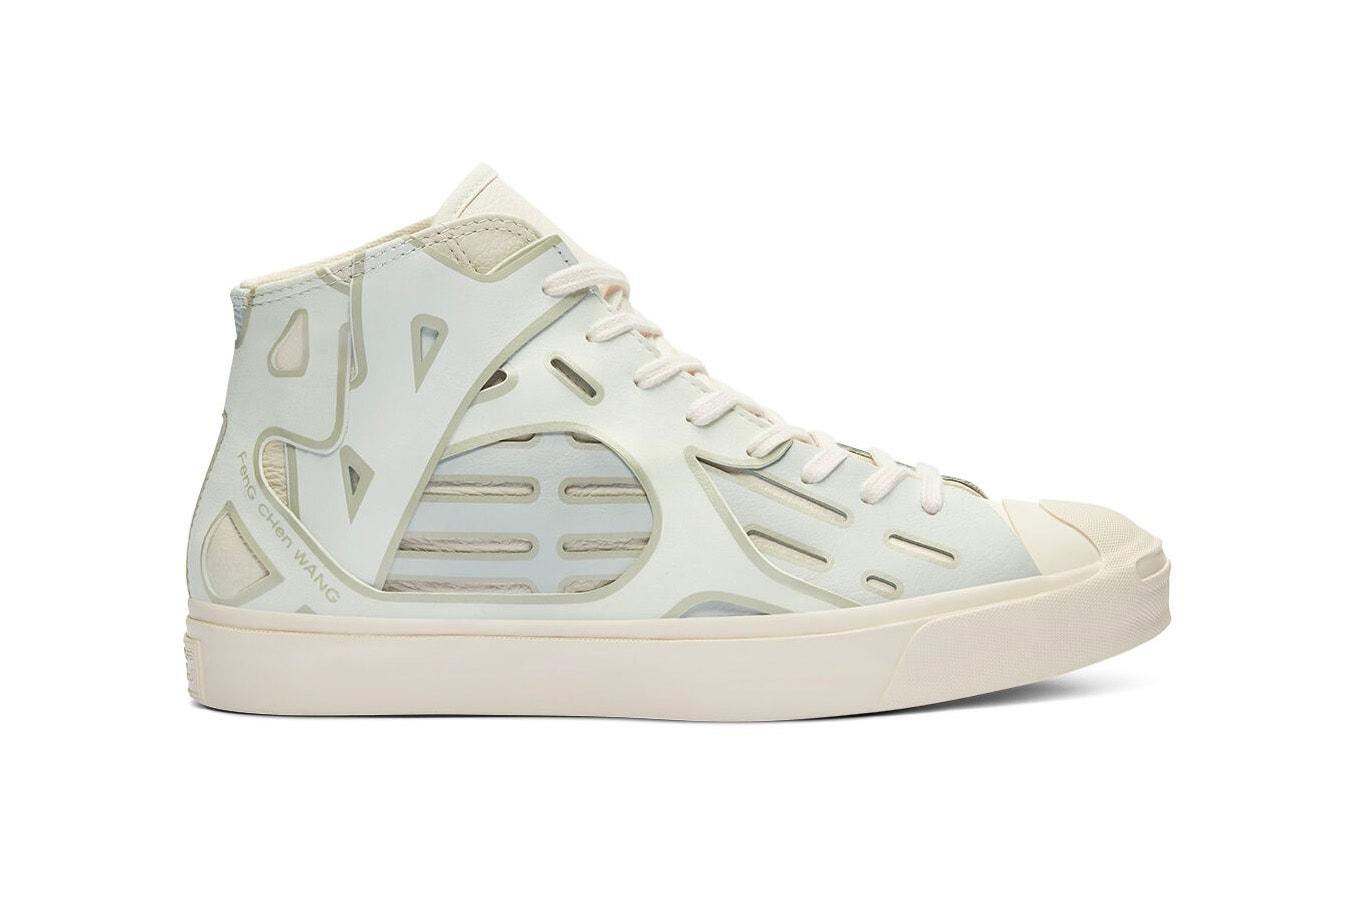 Converse Timeless Sneaker Shoe Chuck 70 Jack Purcell One Star Run Star Hike Footwear Collaborations Tyler The Creator Telfar Brain Dead